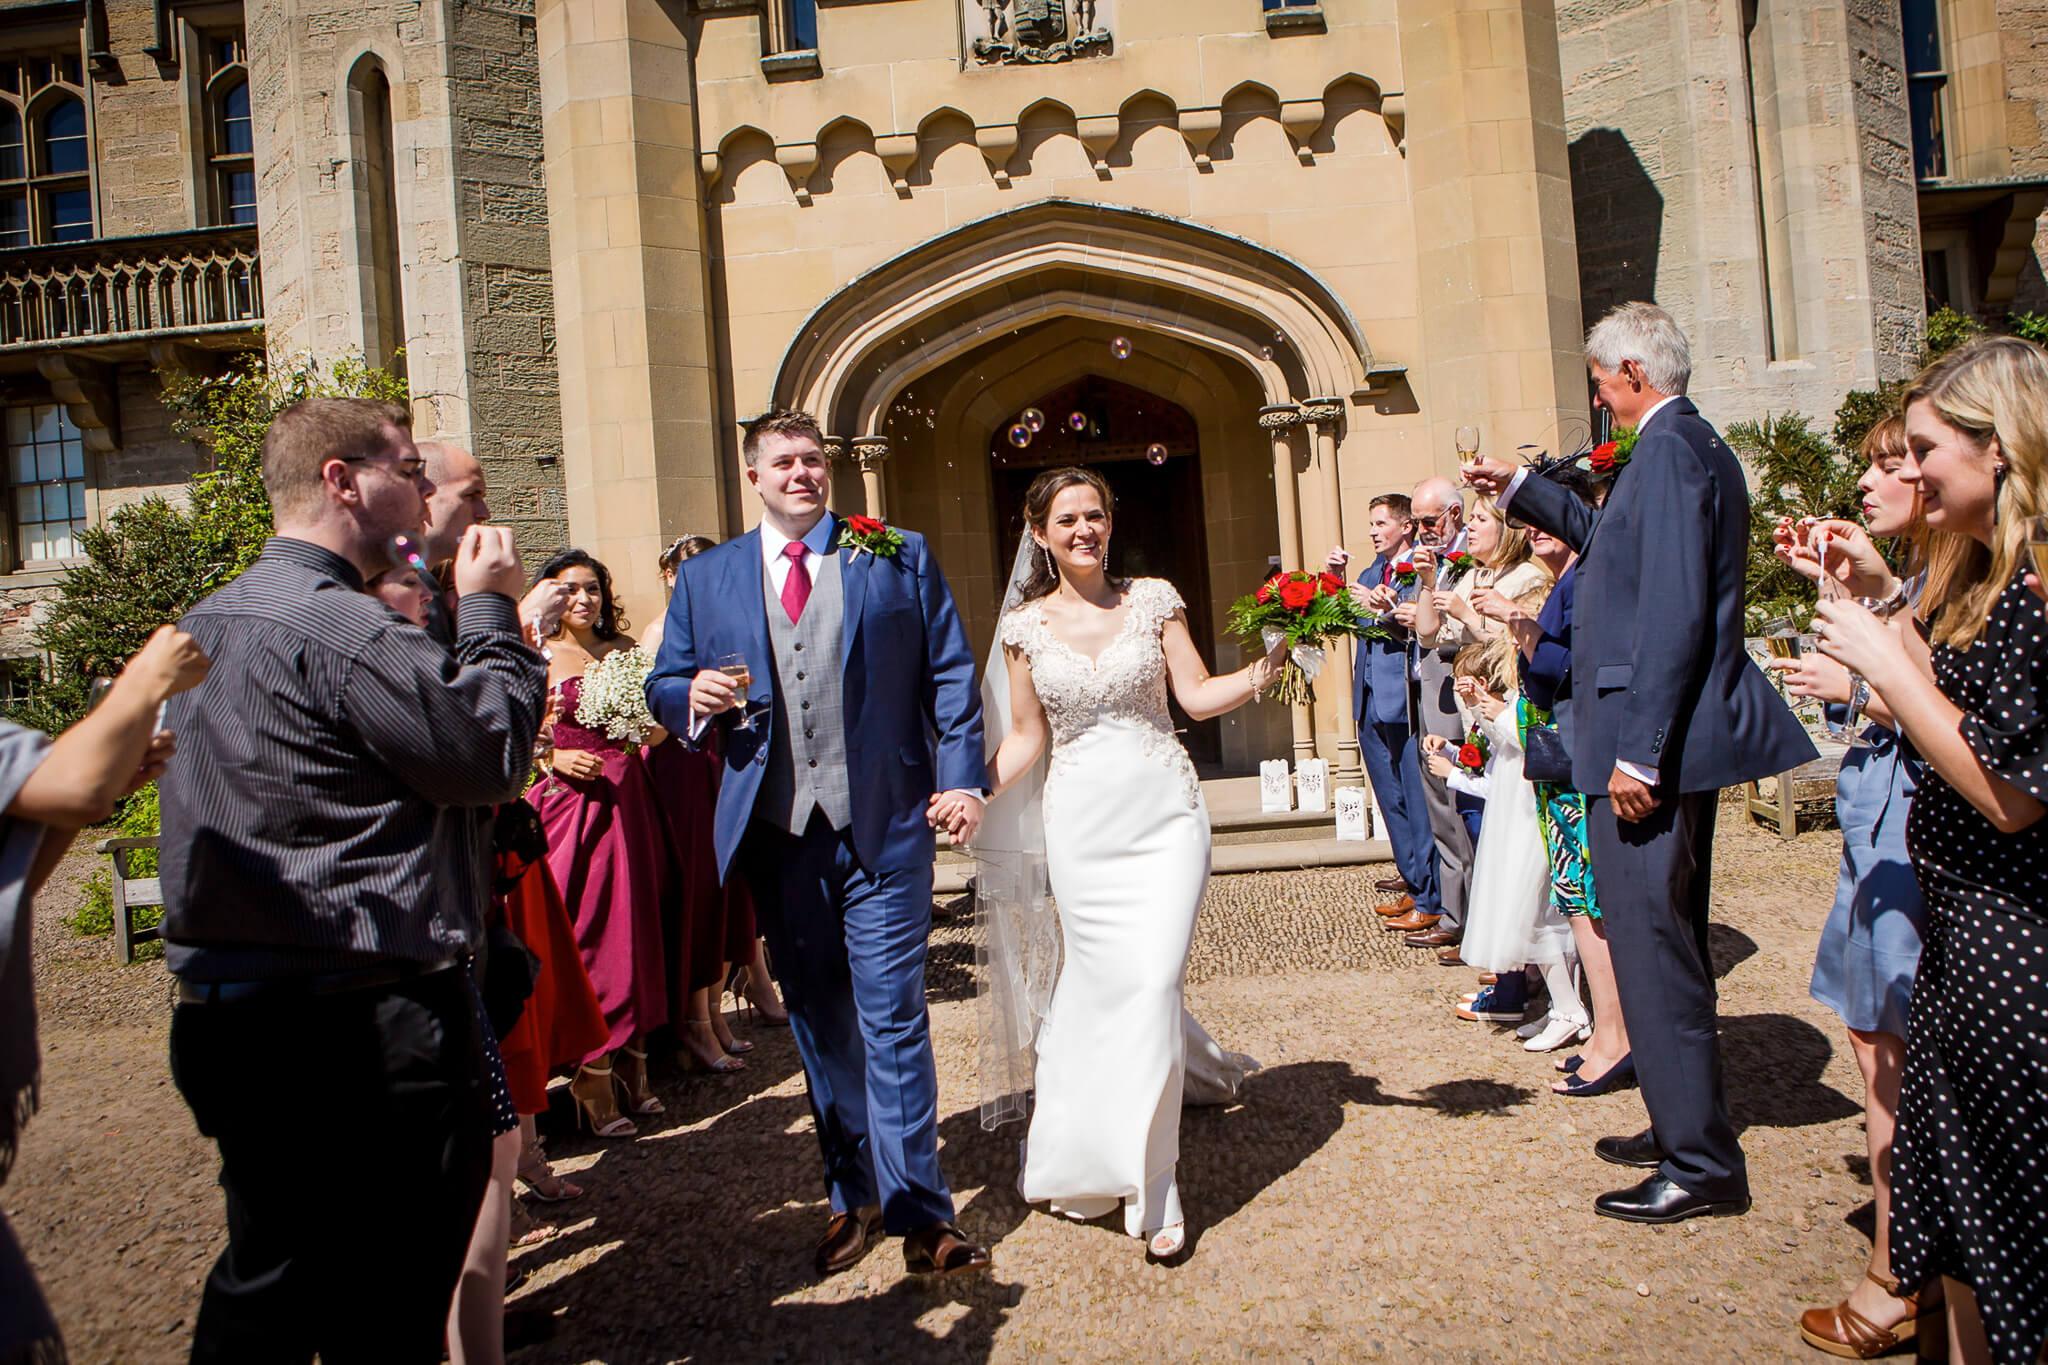 duns-castle-wedding-photograper-scotland-stanbury-photography-012